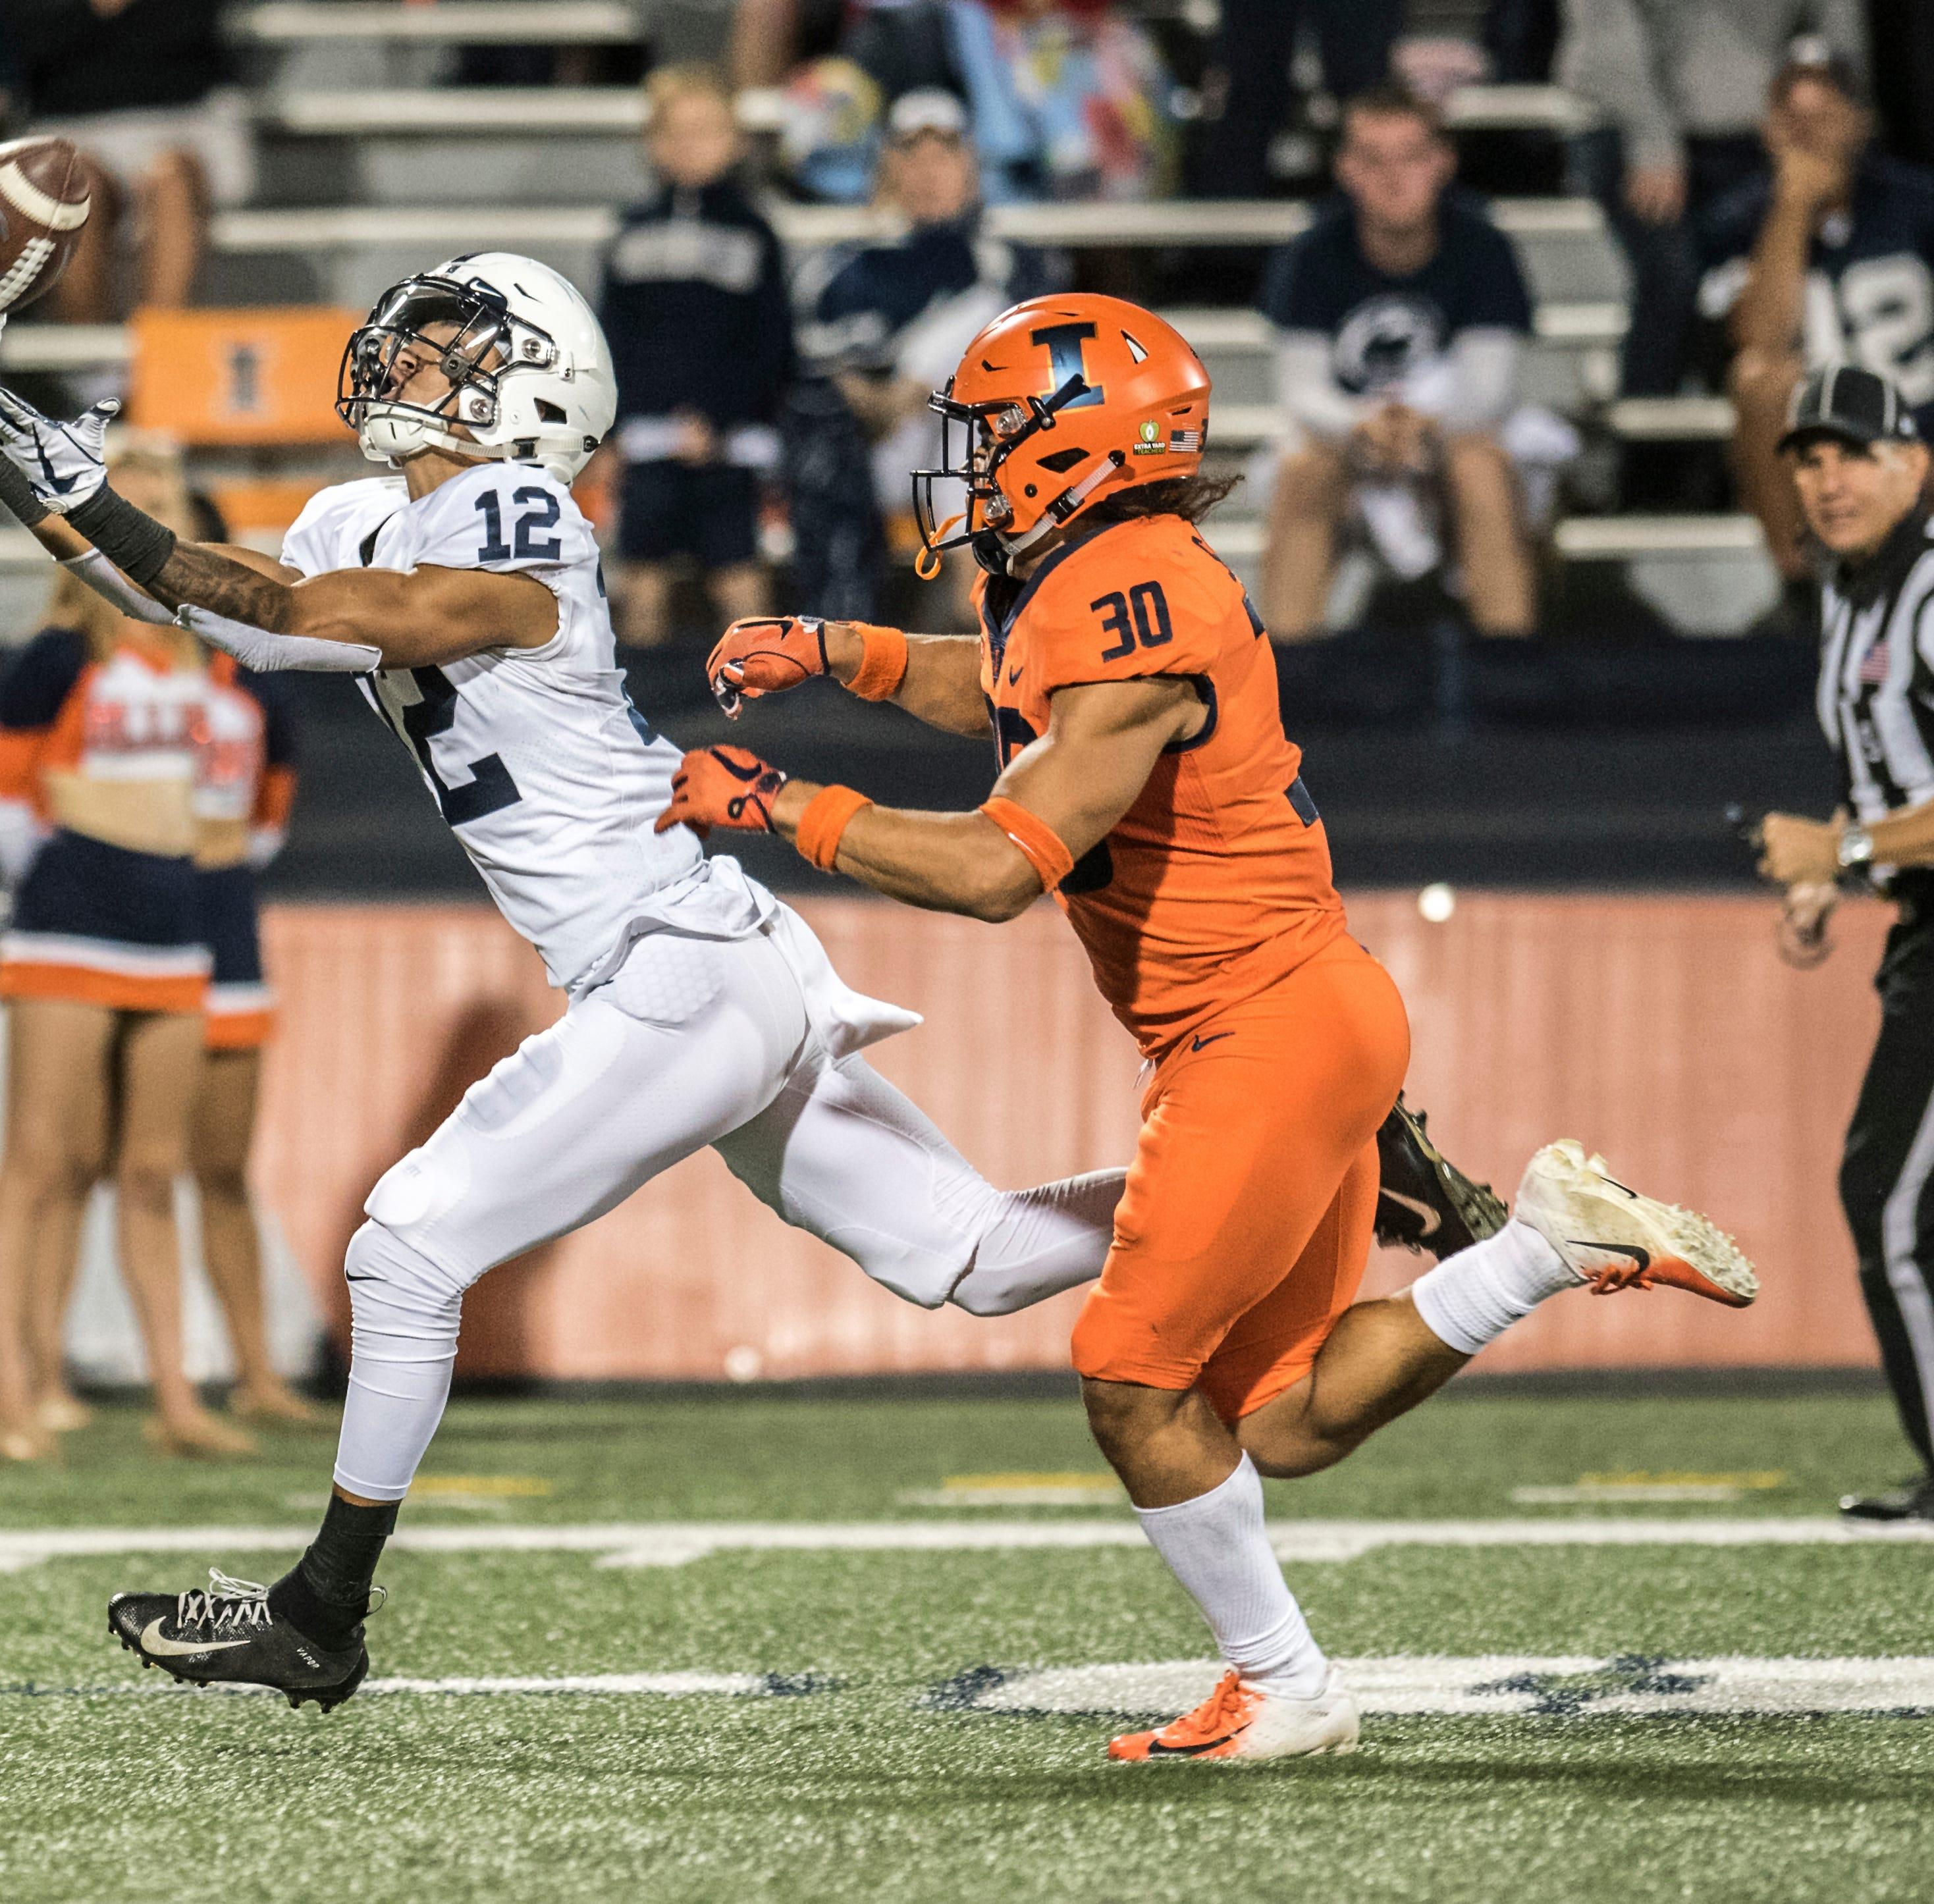 Penn State Spotlight: Growing role for two-sport Mac Hippenhammer?